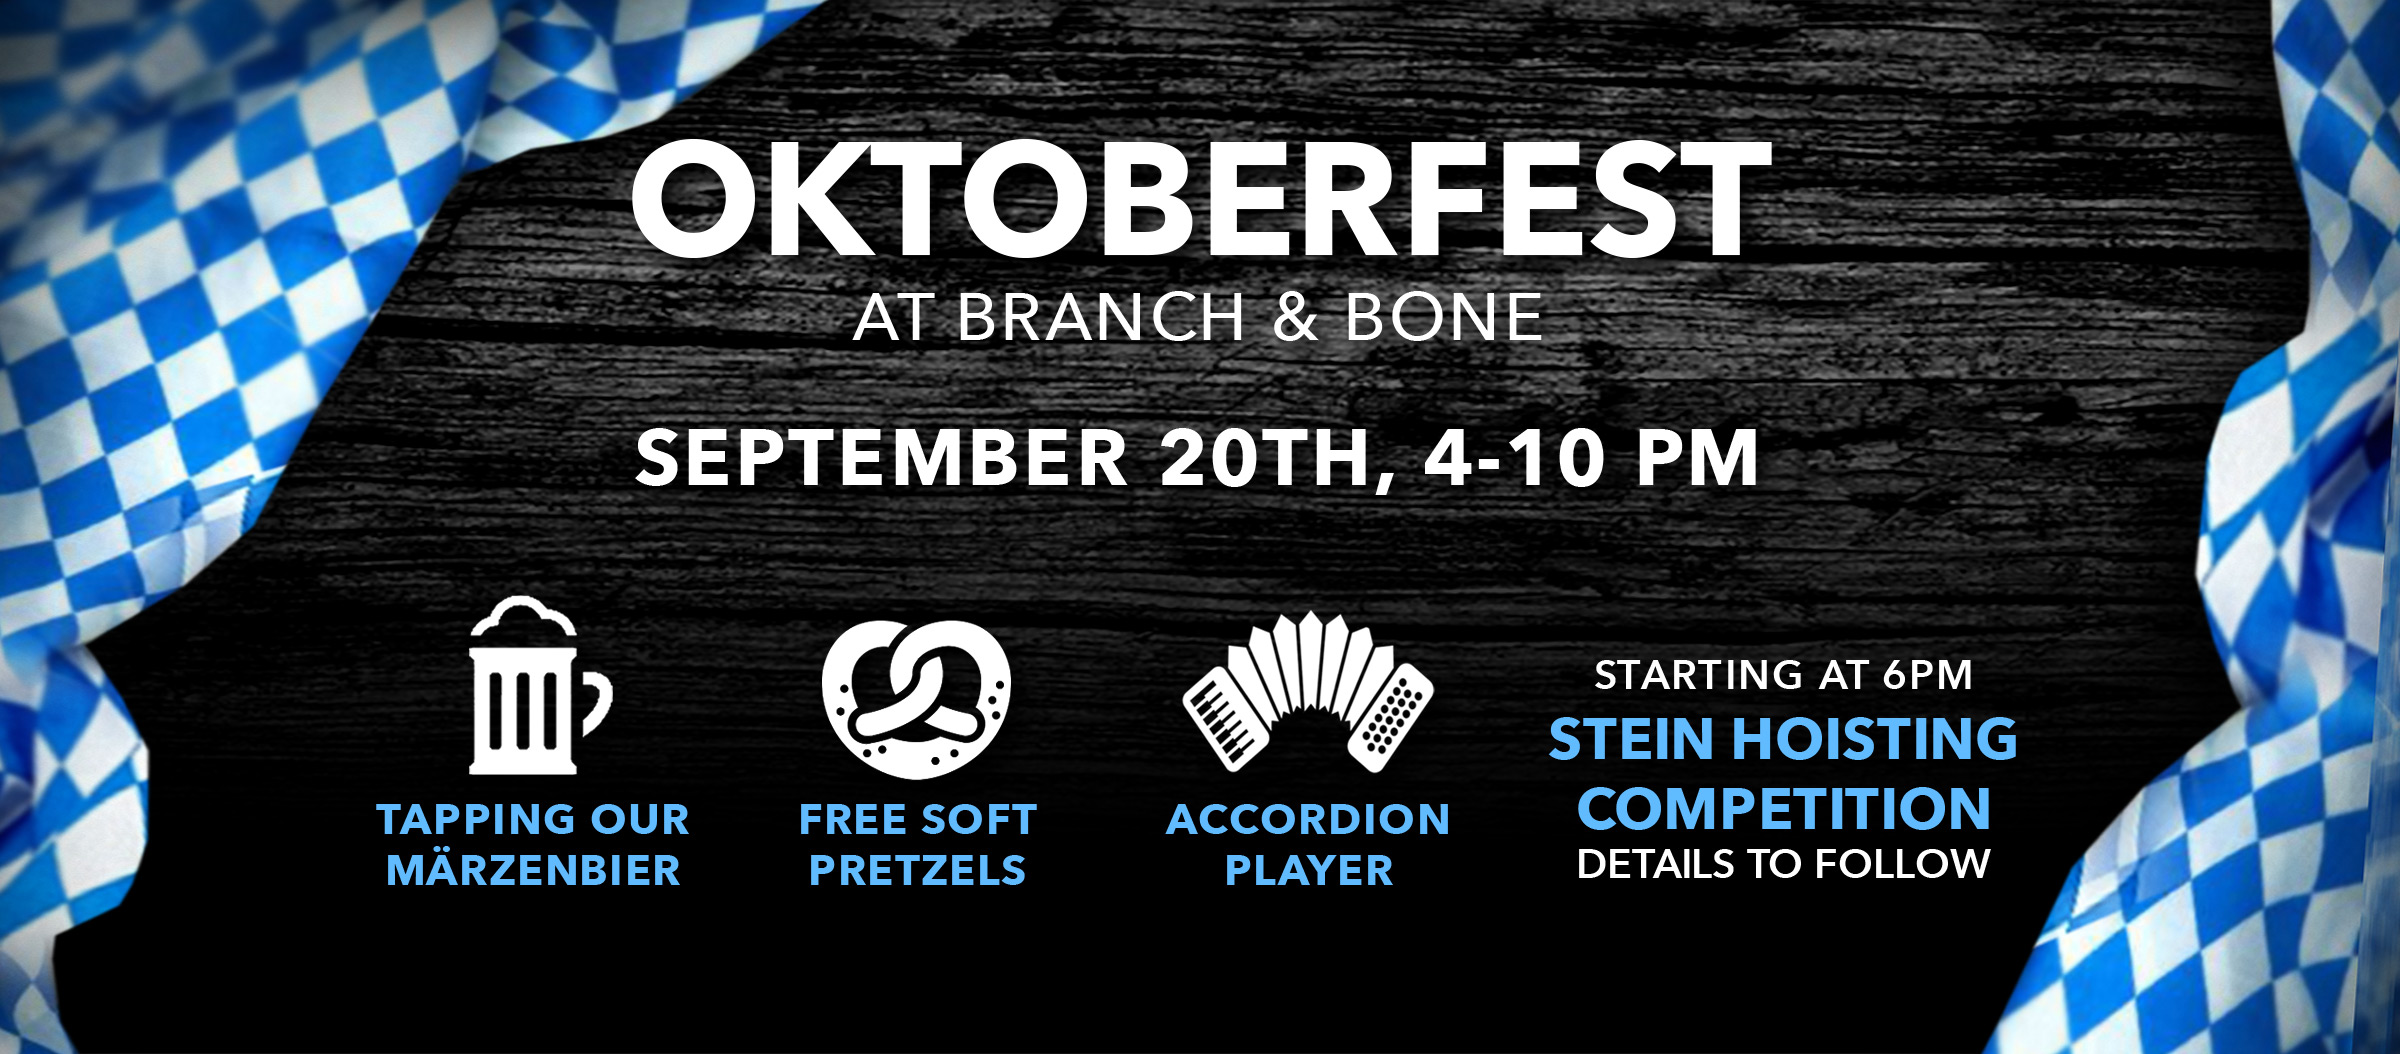 Oktoberfest_2018_Event-Page.jpg